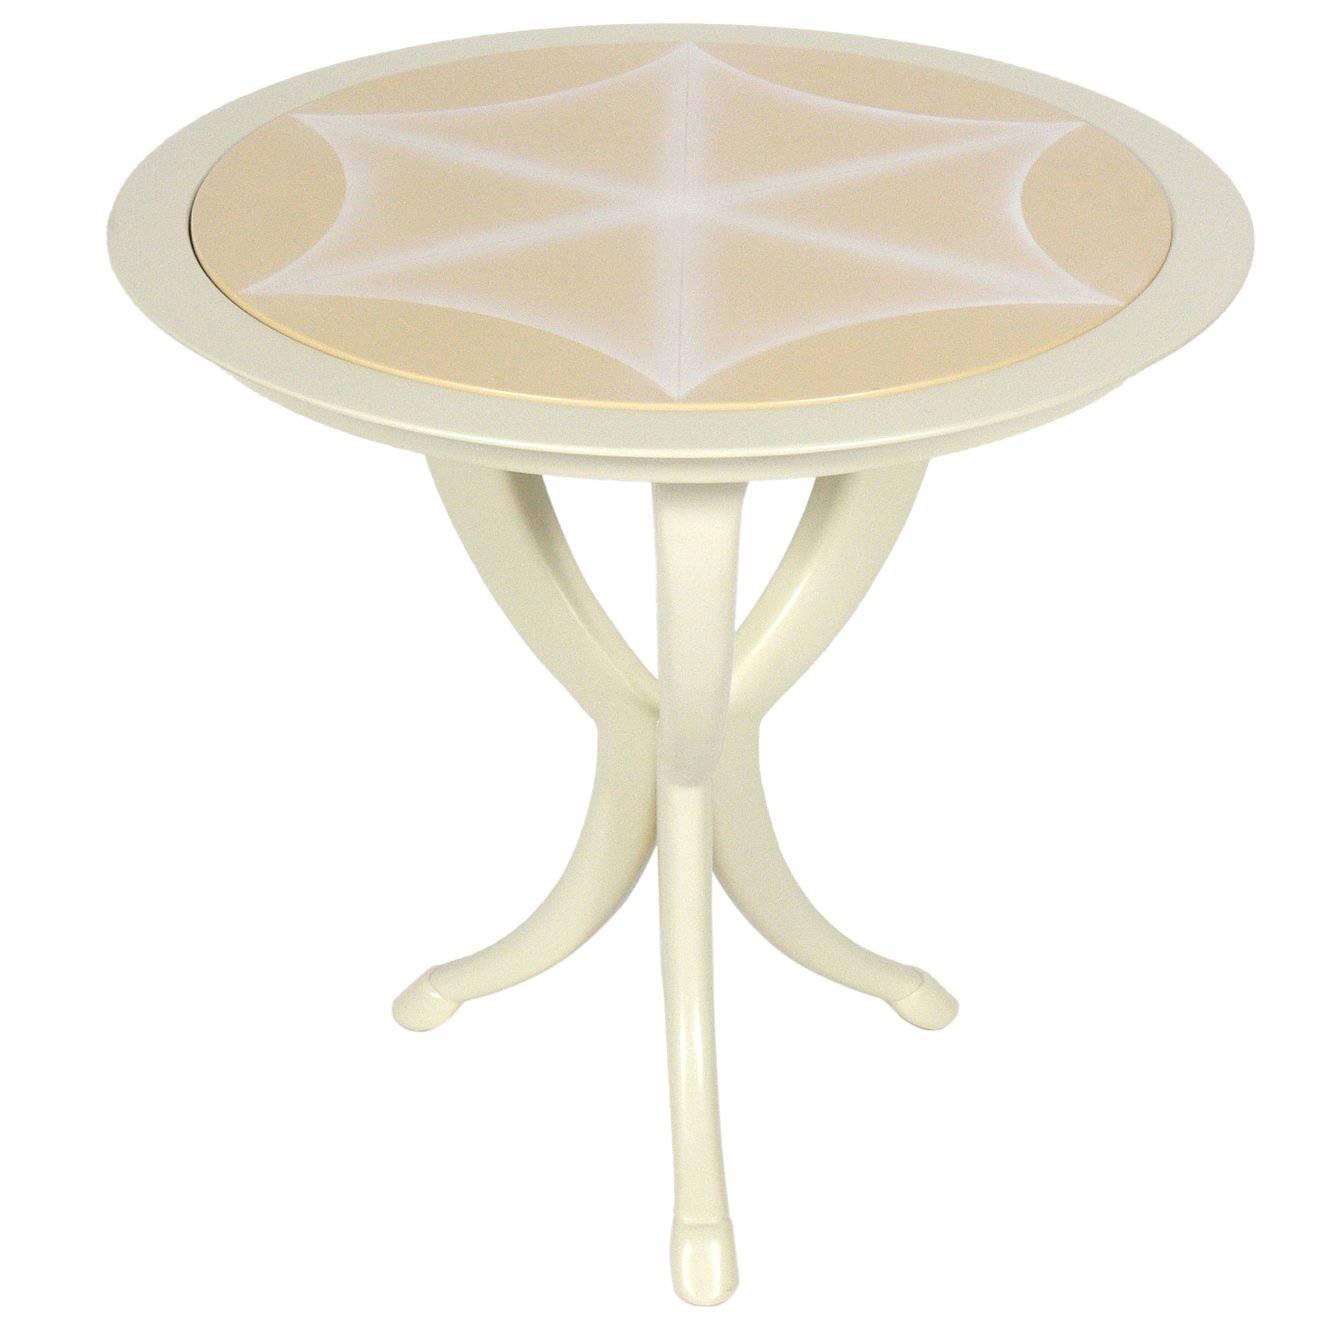 Glamorous White Lacquer Table by Roger Thomas for Ferrell & Mittman